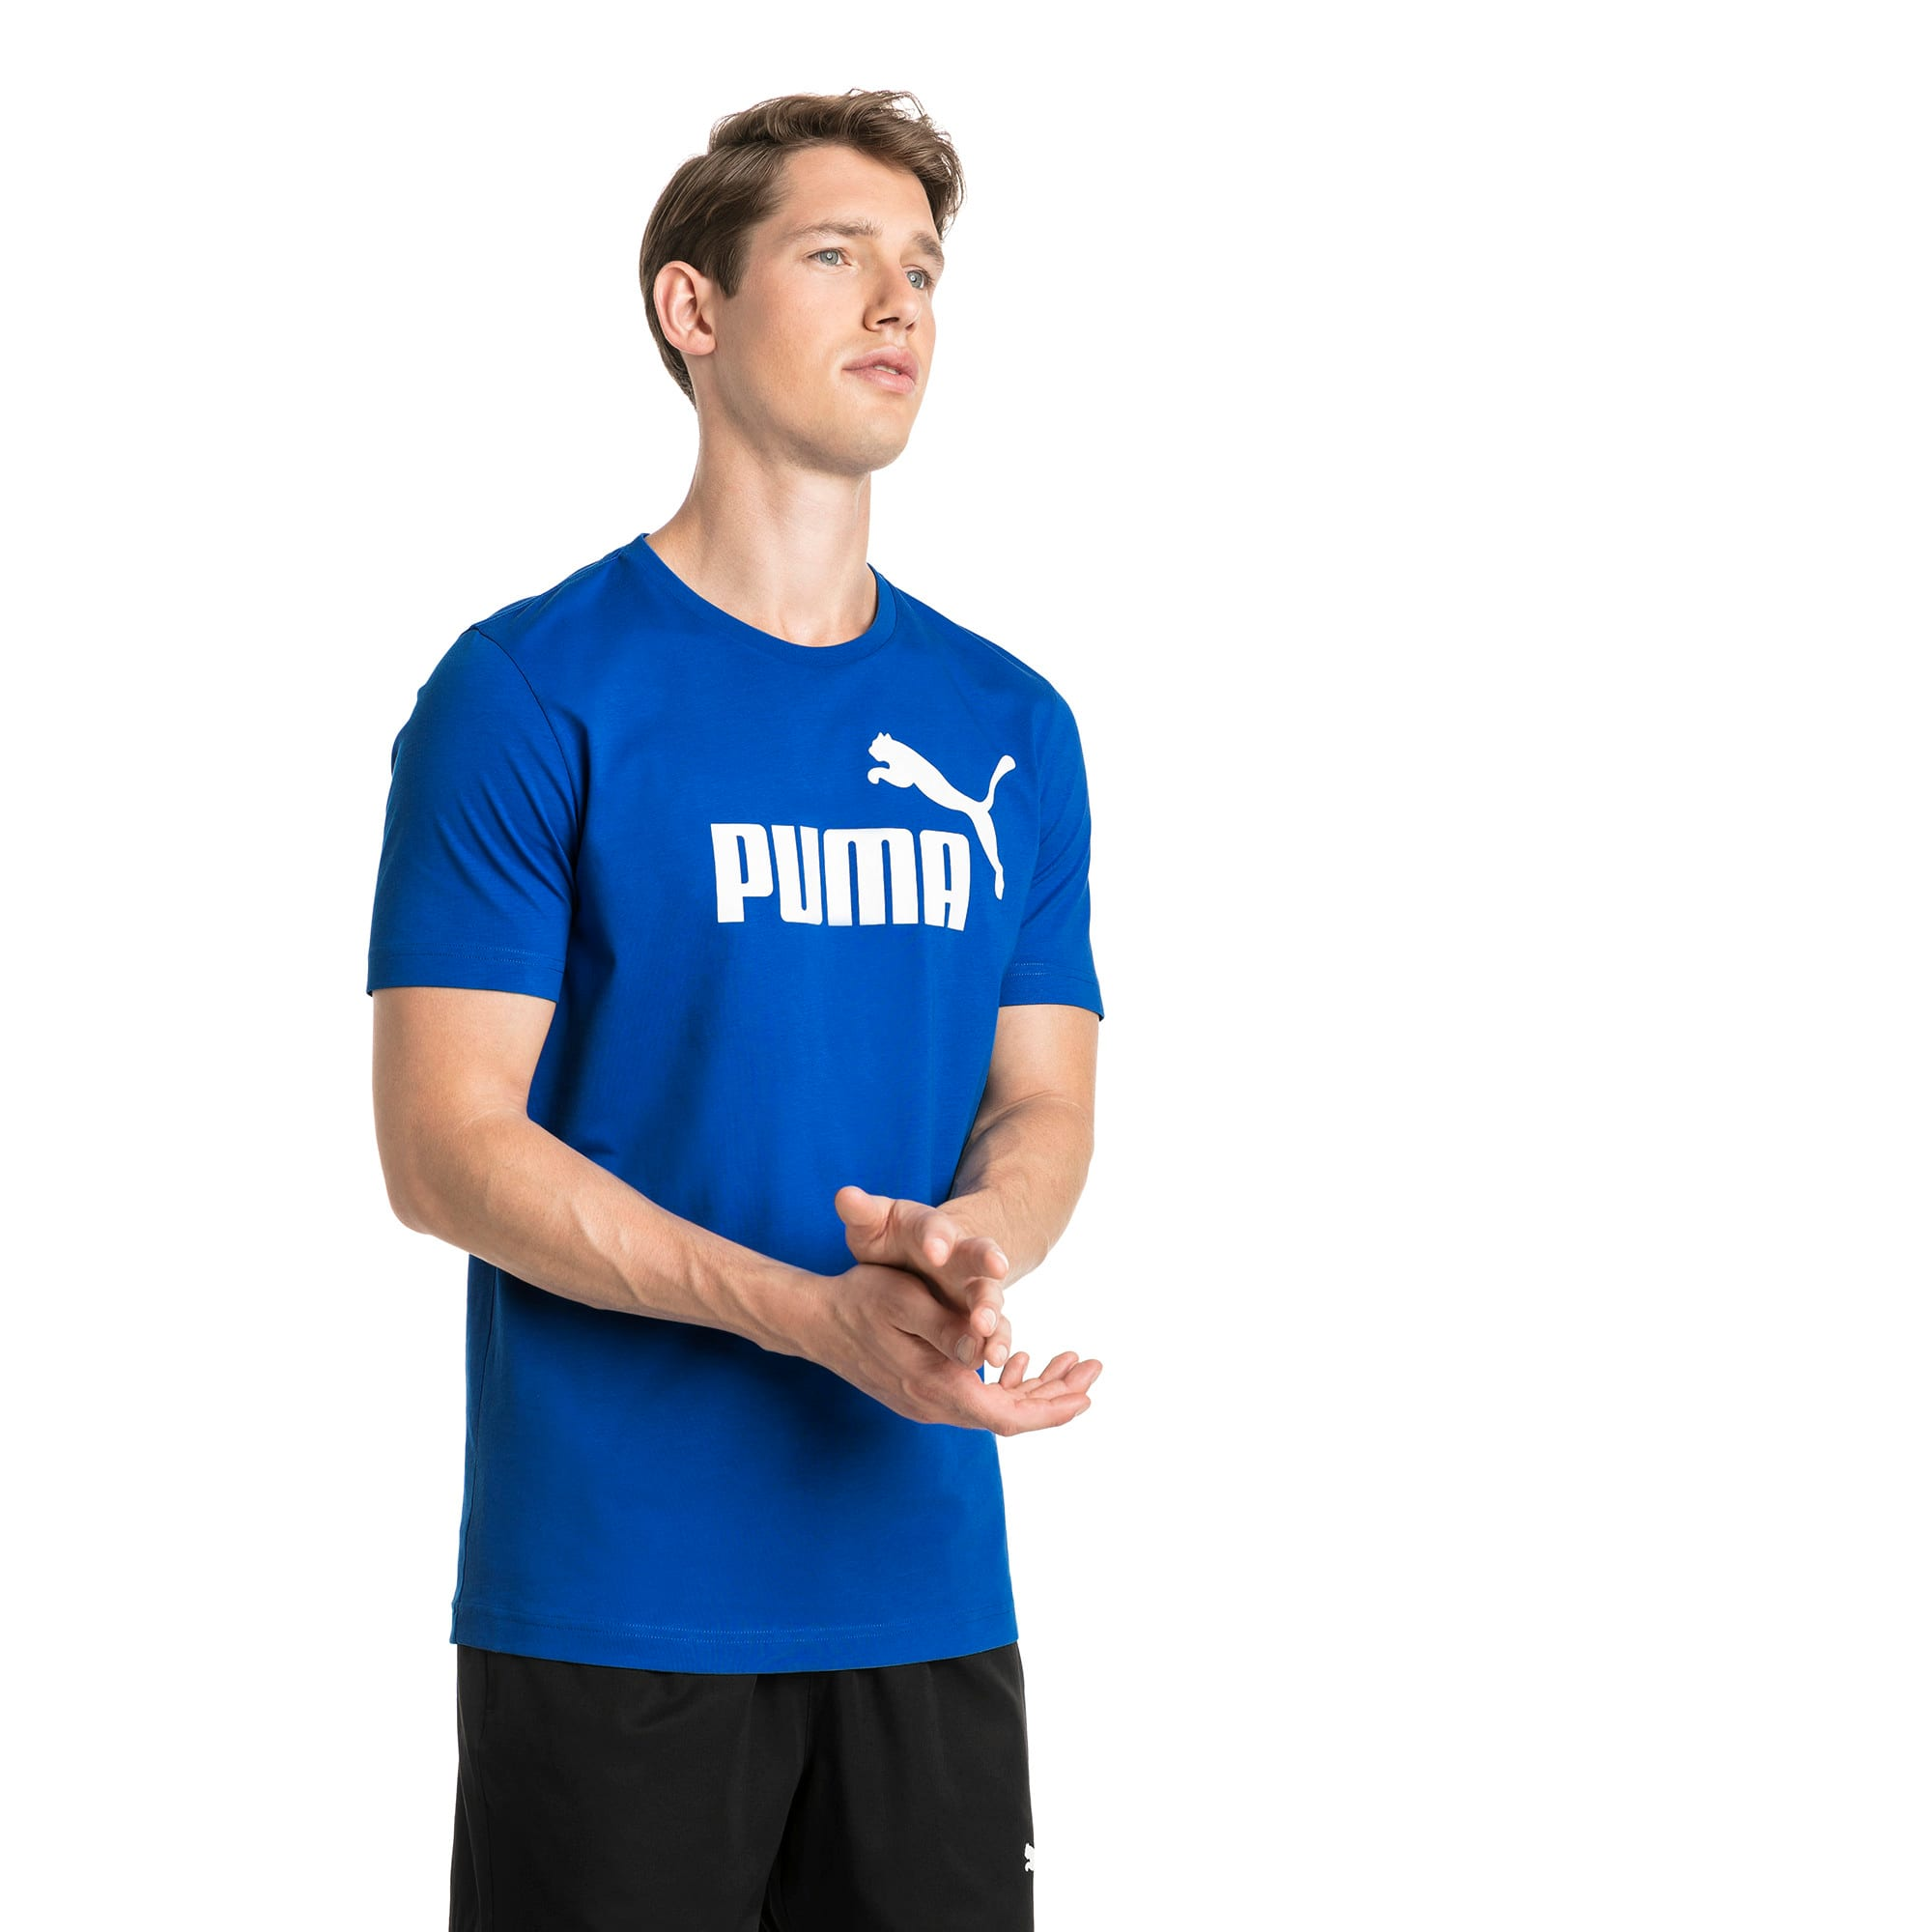 Thumbnail 1 of T-shirt a maniche corte Essentials uomo, Puma Royal, medium